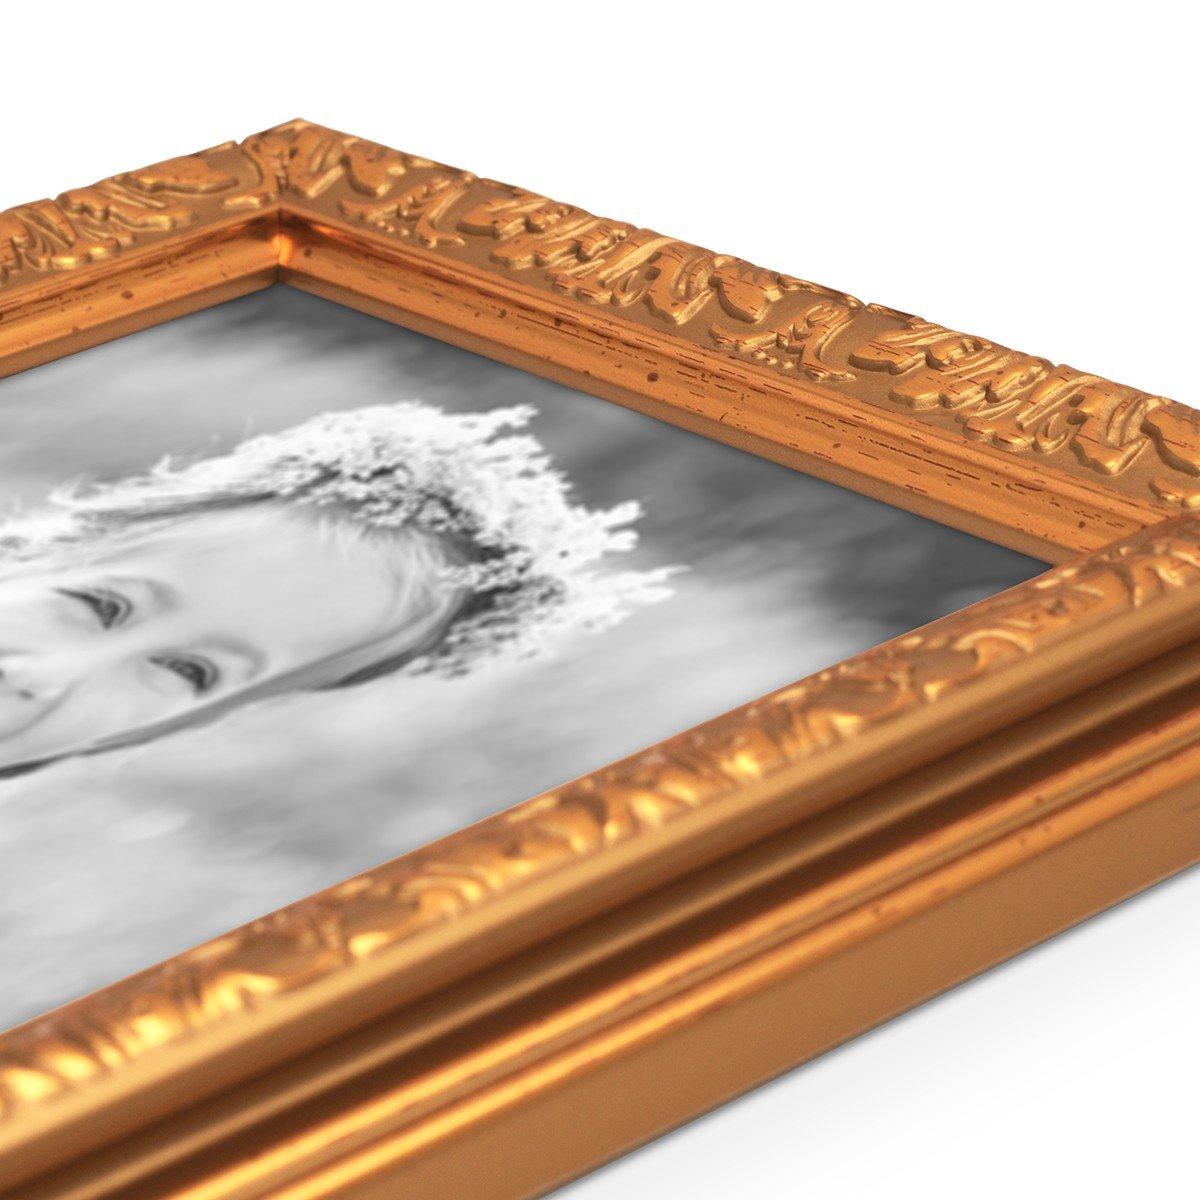 Photolini Bilderrahmen Antik Gold Nostalgie 21x30 cm DIN A4 ...